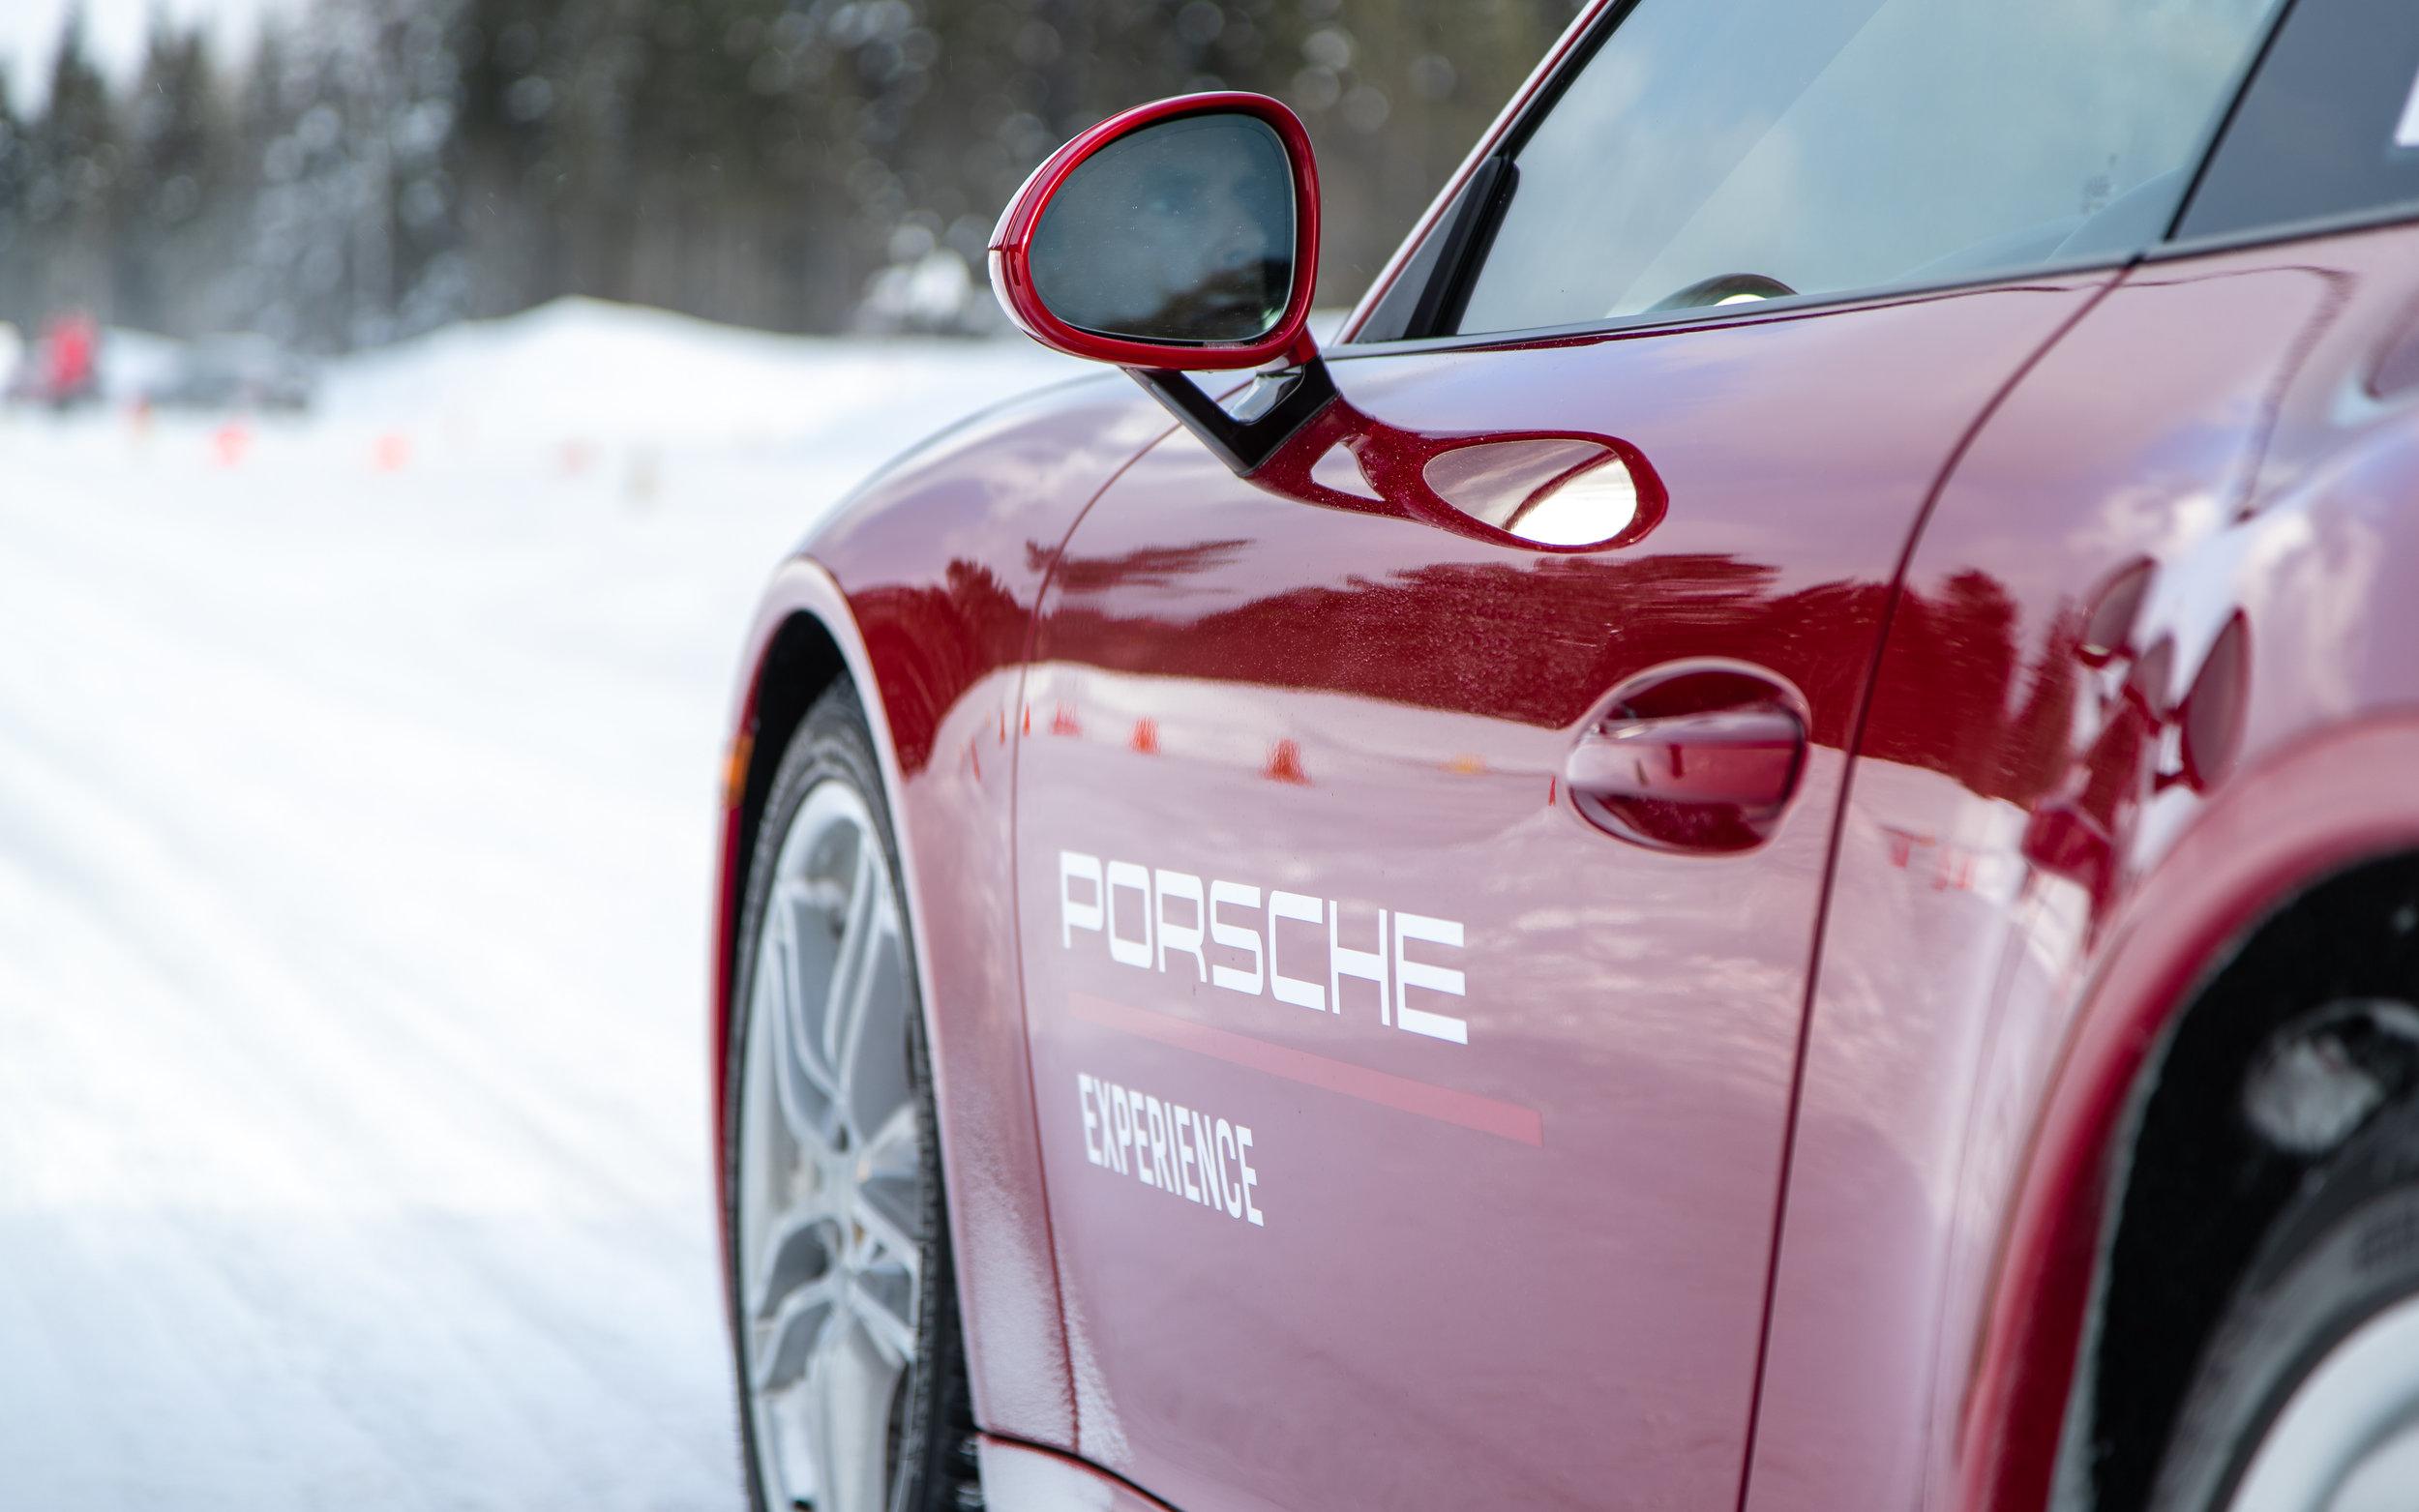 Porsche-Ice-Experience-Canada-Media-146.jpg